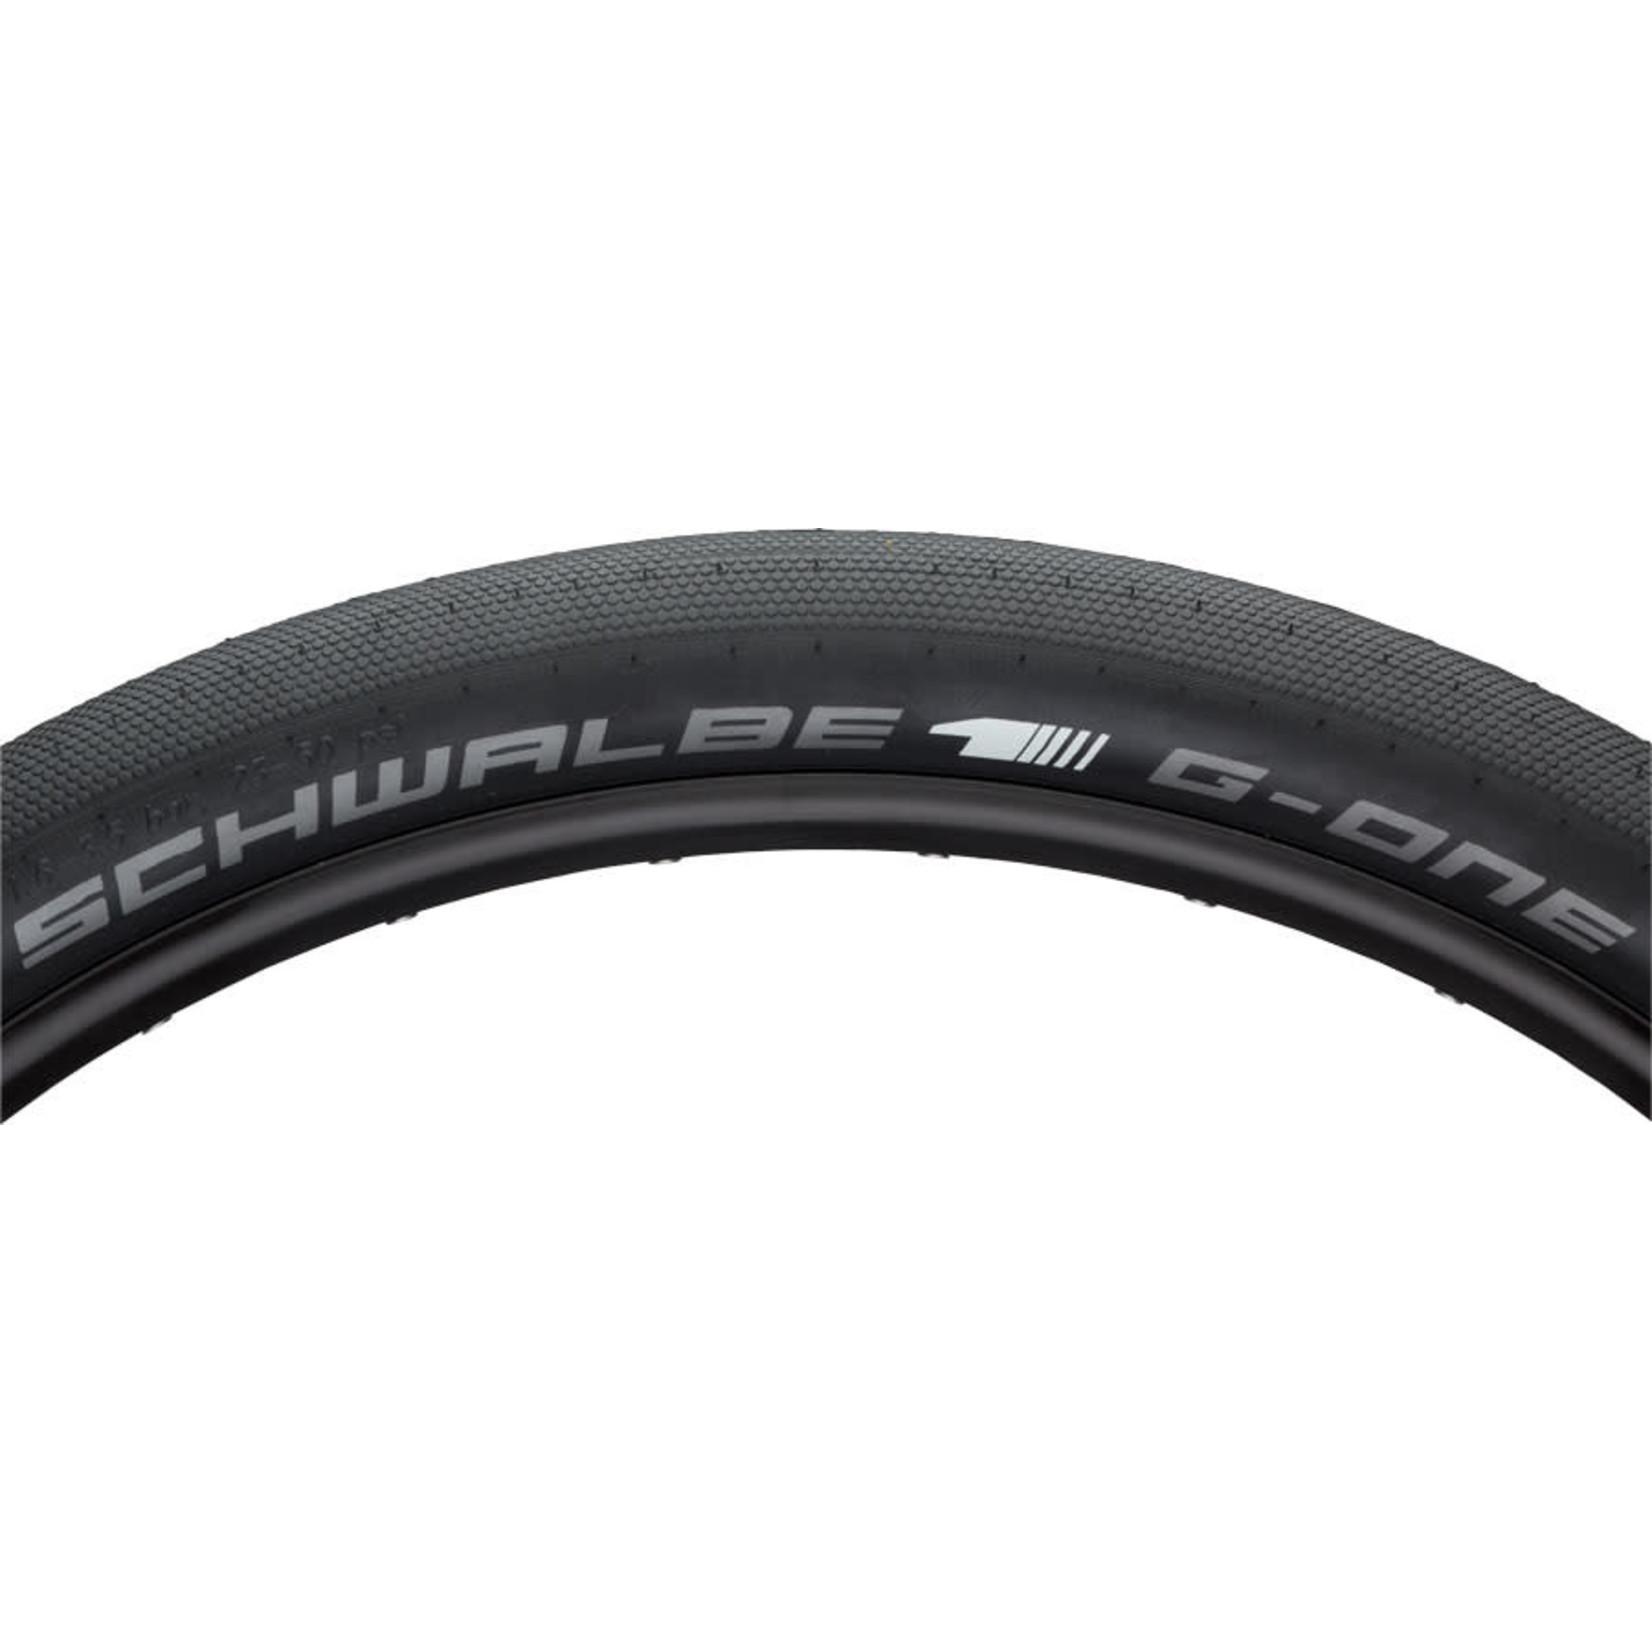 Schwalbe Schwalbe G-One Speed Tire - 29 x 2.35, Tubeless, Folding, Black, Evolution Line, SnakeSkin